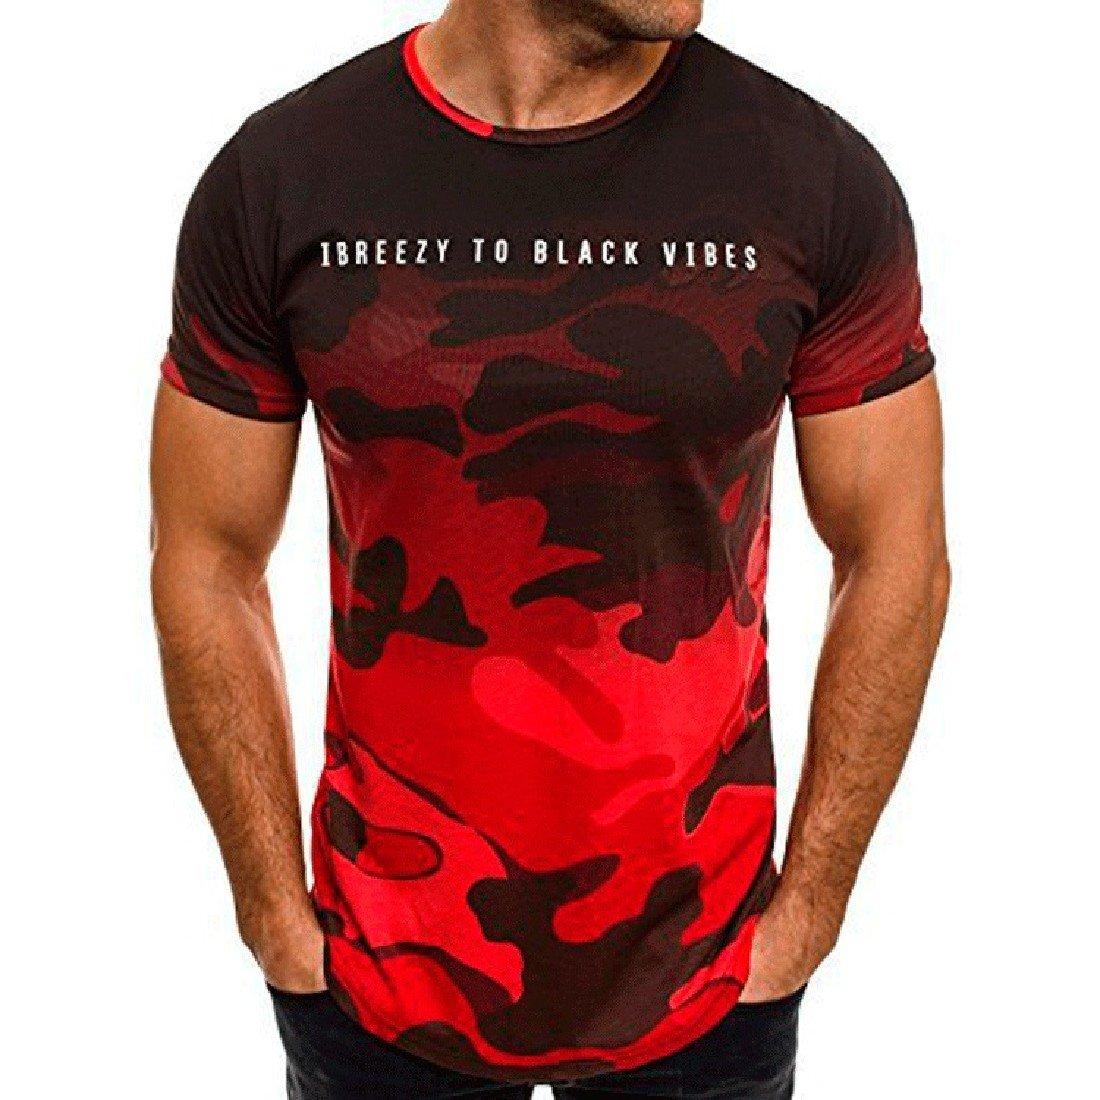 VITryst-Men Plus Size O-Neck Short-Sleeve Camouflage T-Shirt Top